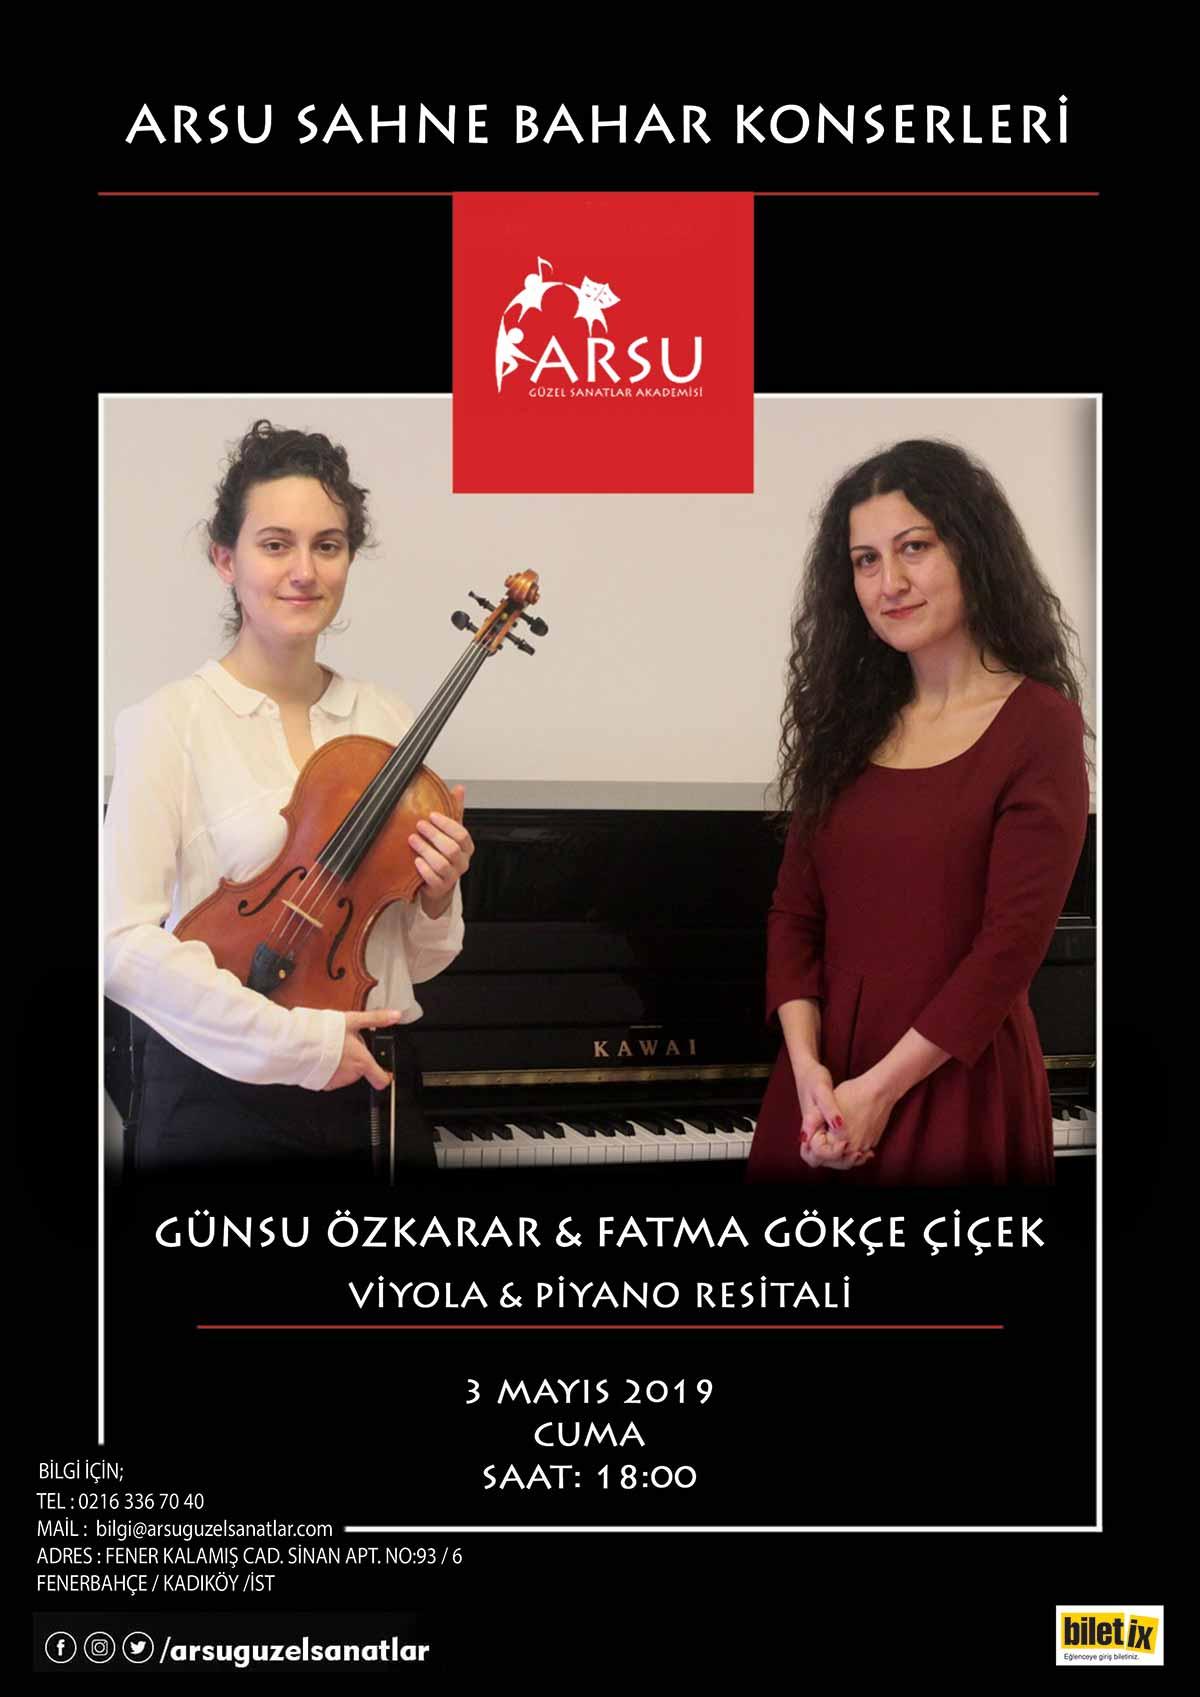 gunsu_ozkarar_fatma_cicek_konser_afis